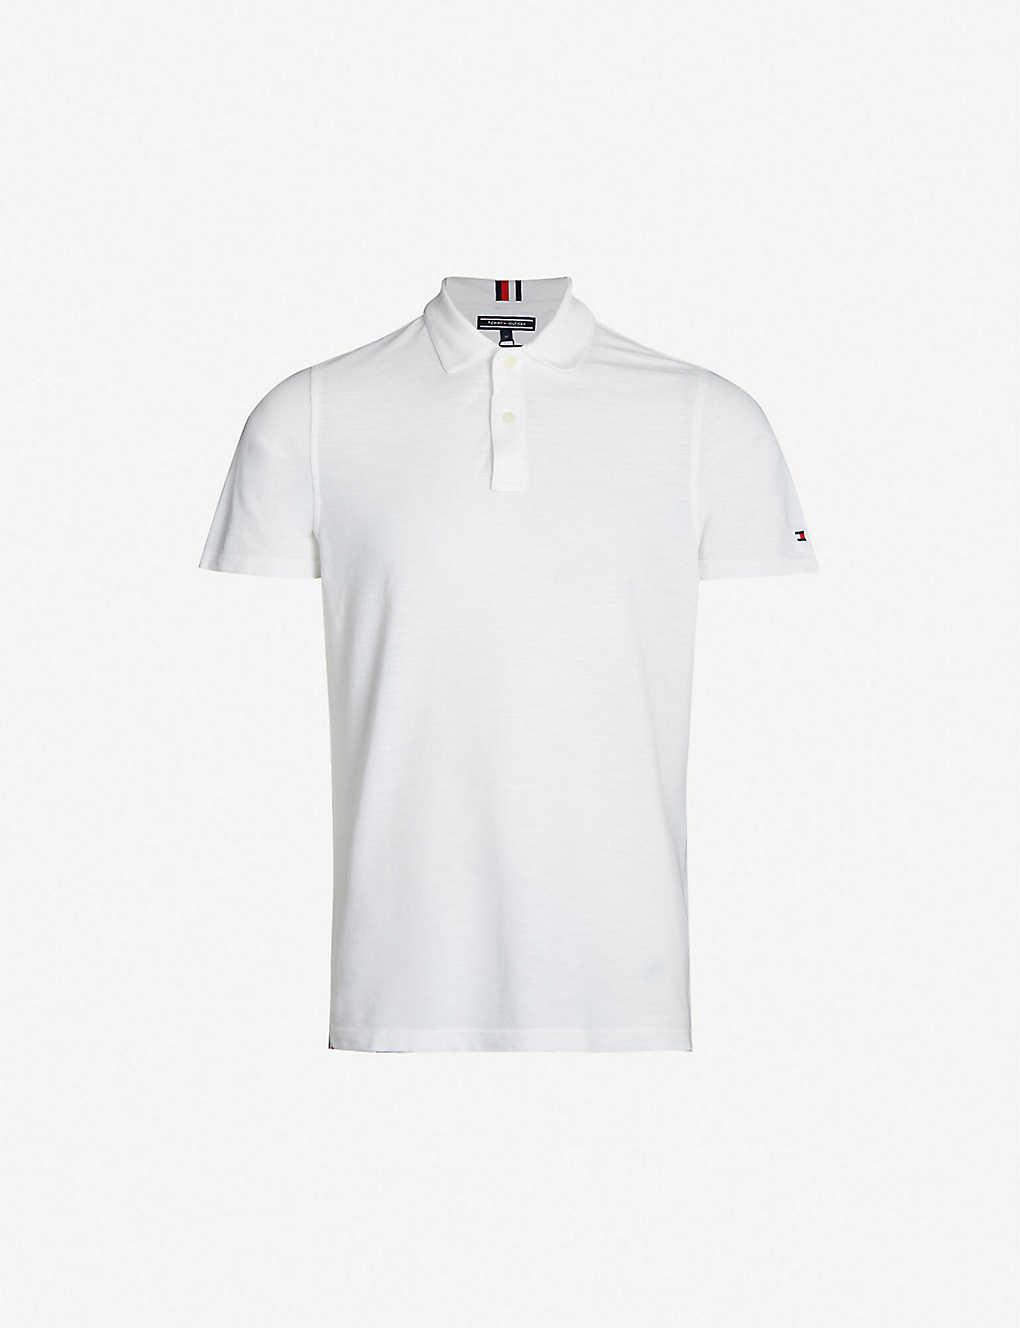 Tommy Hilfiger Logo Embroidered Cotton Piqu Polo Shirt